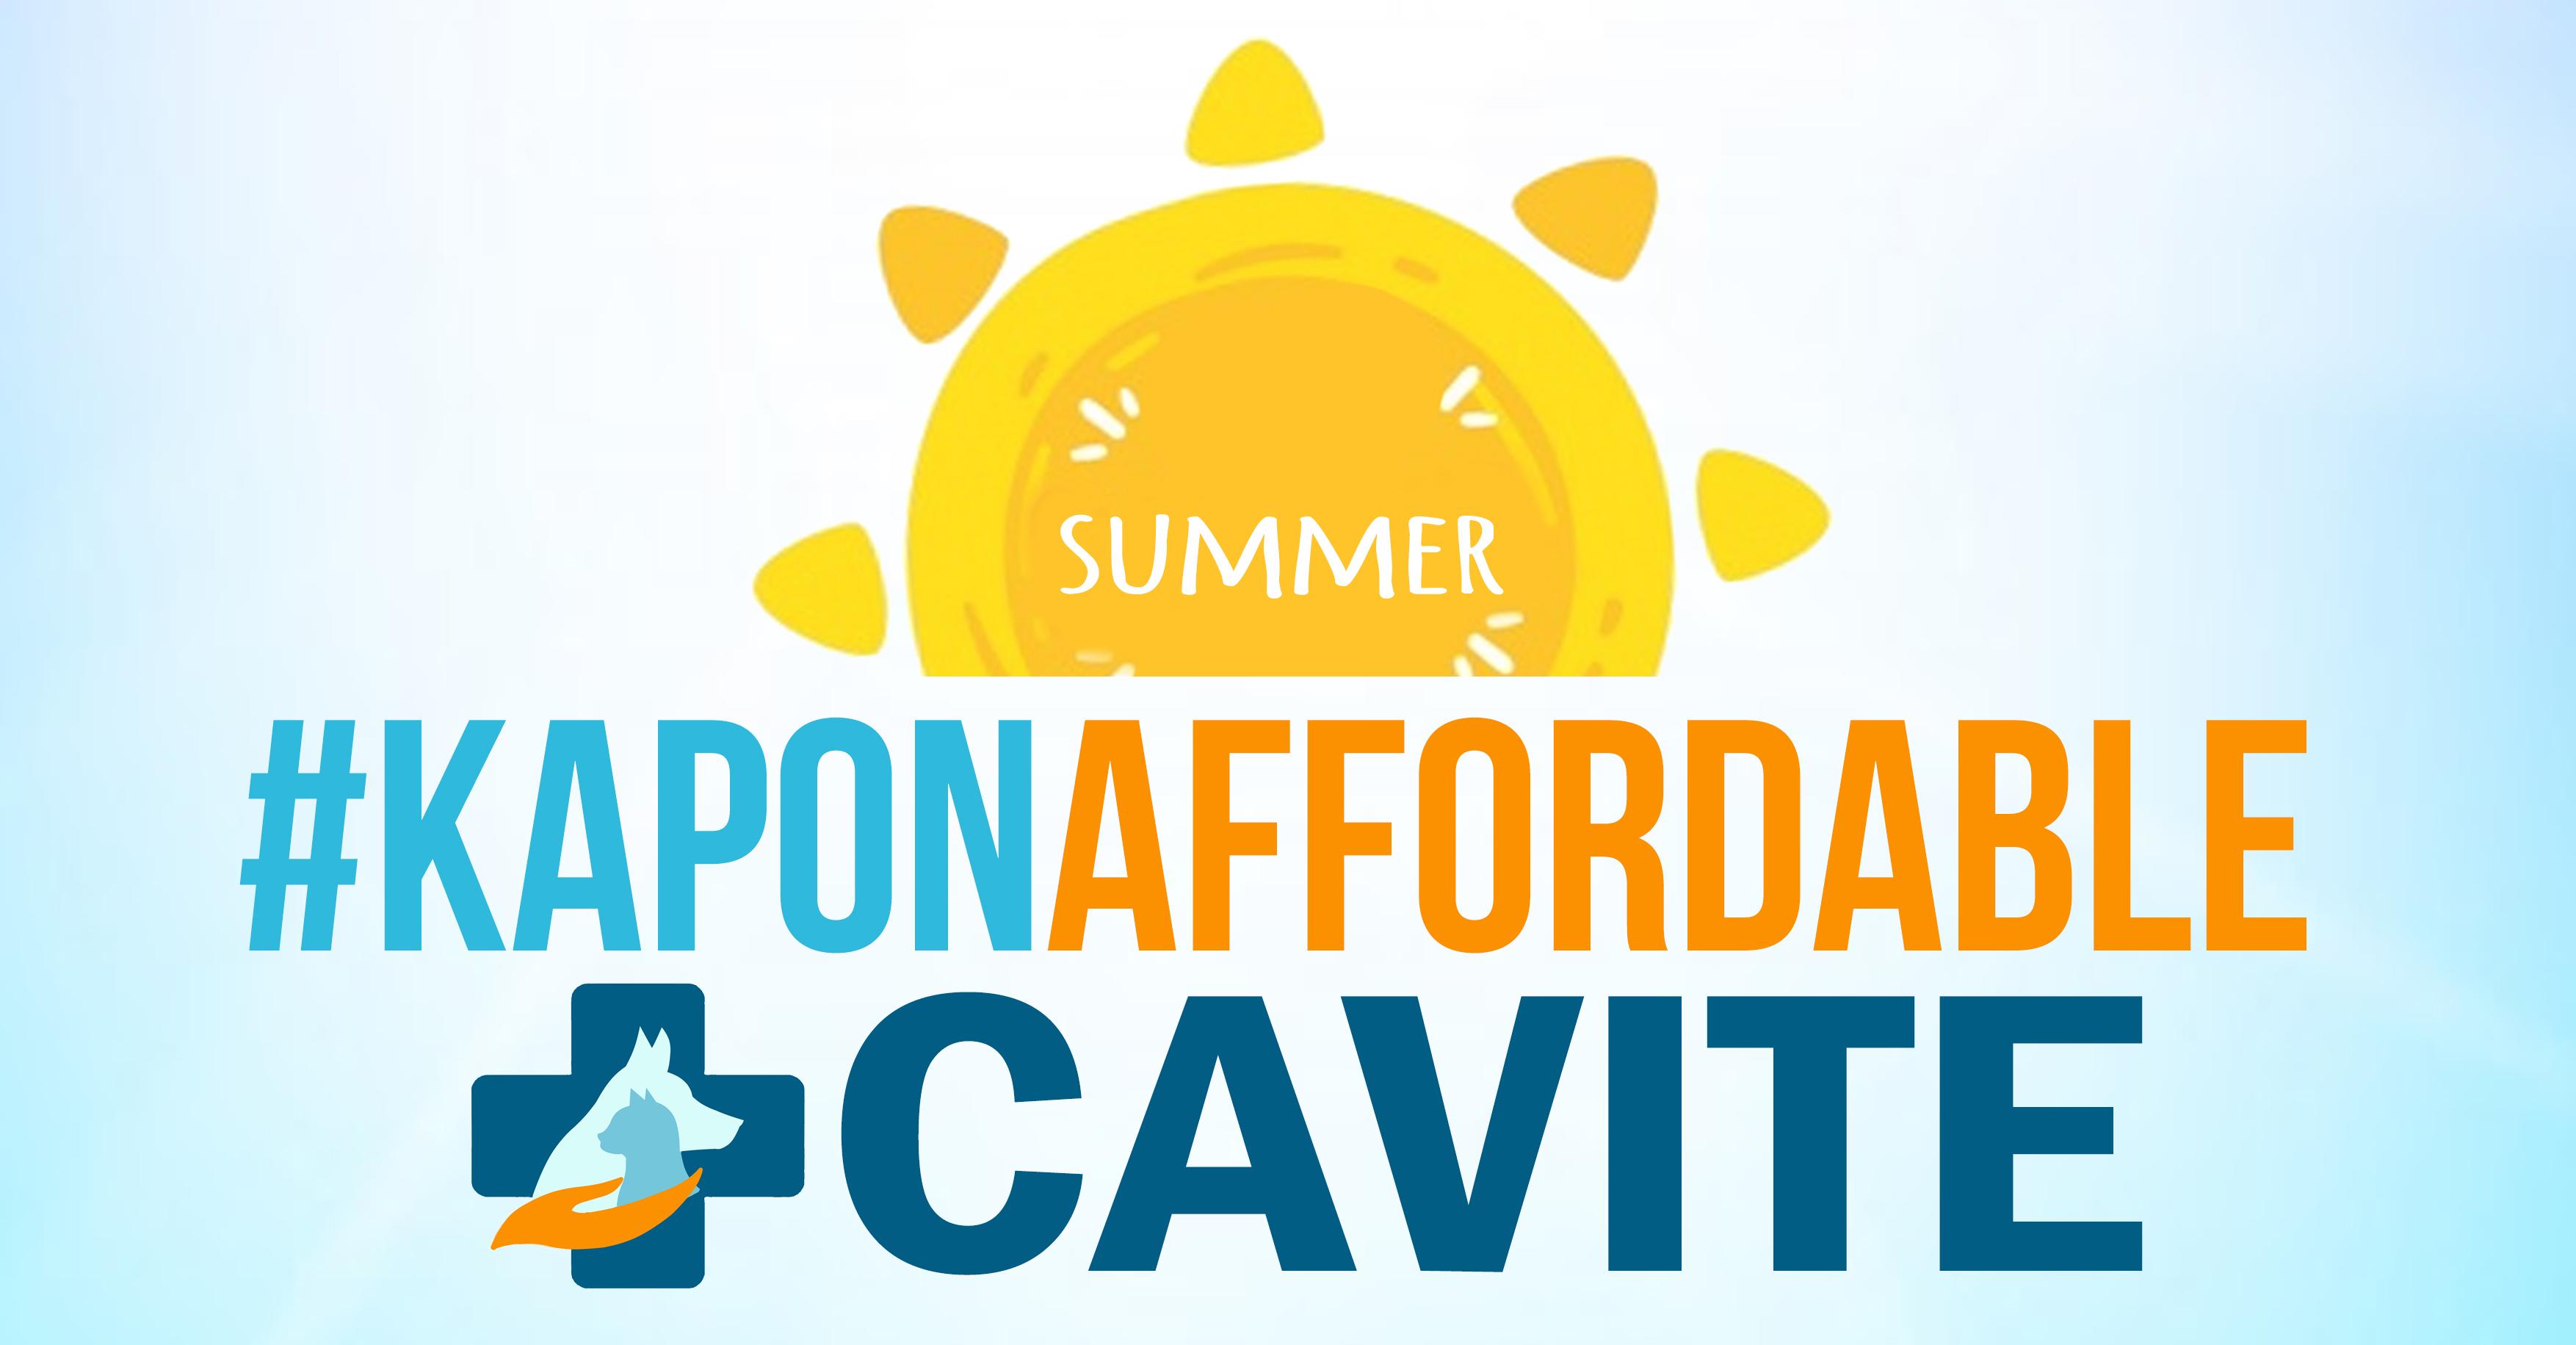 Registration for Cavite KaponAffordable